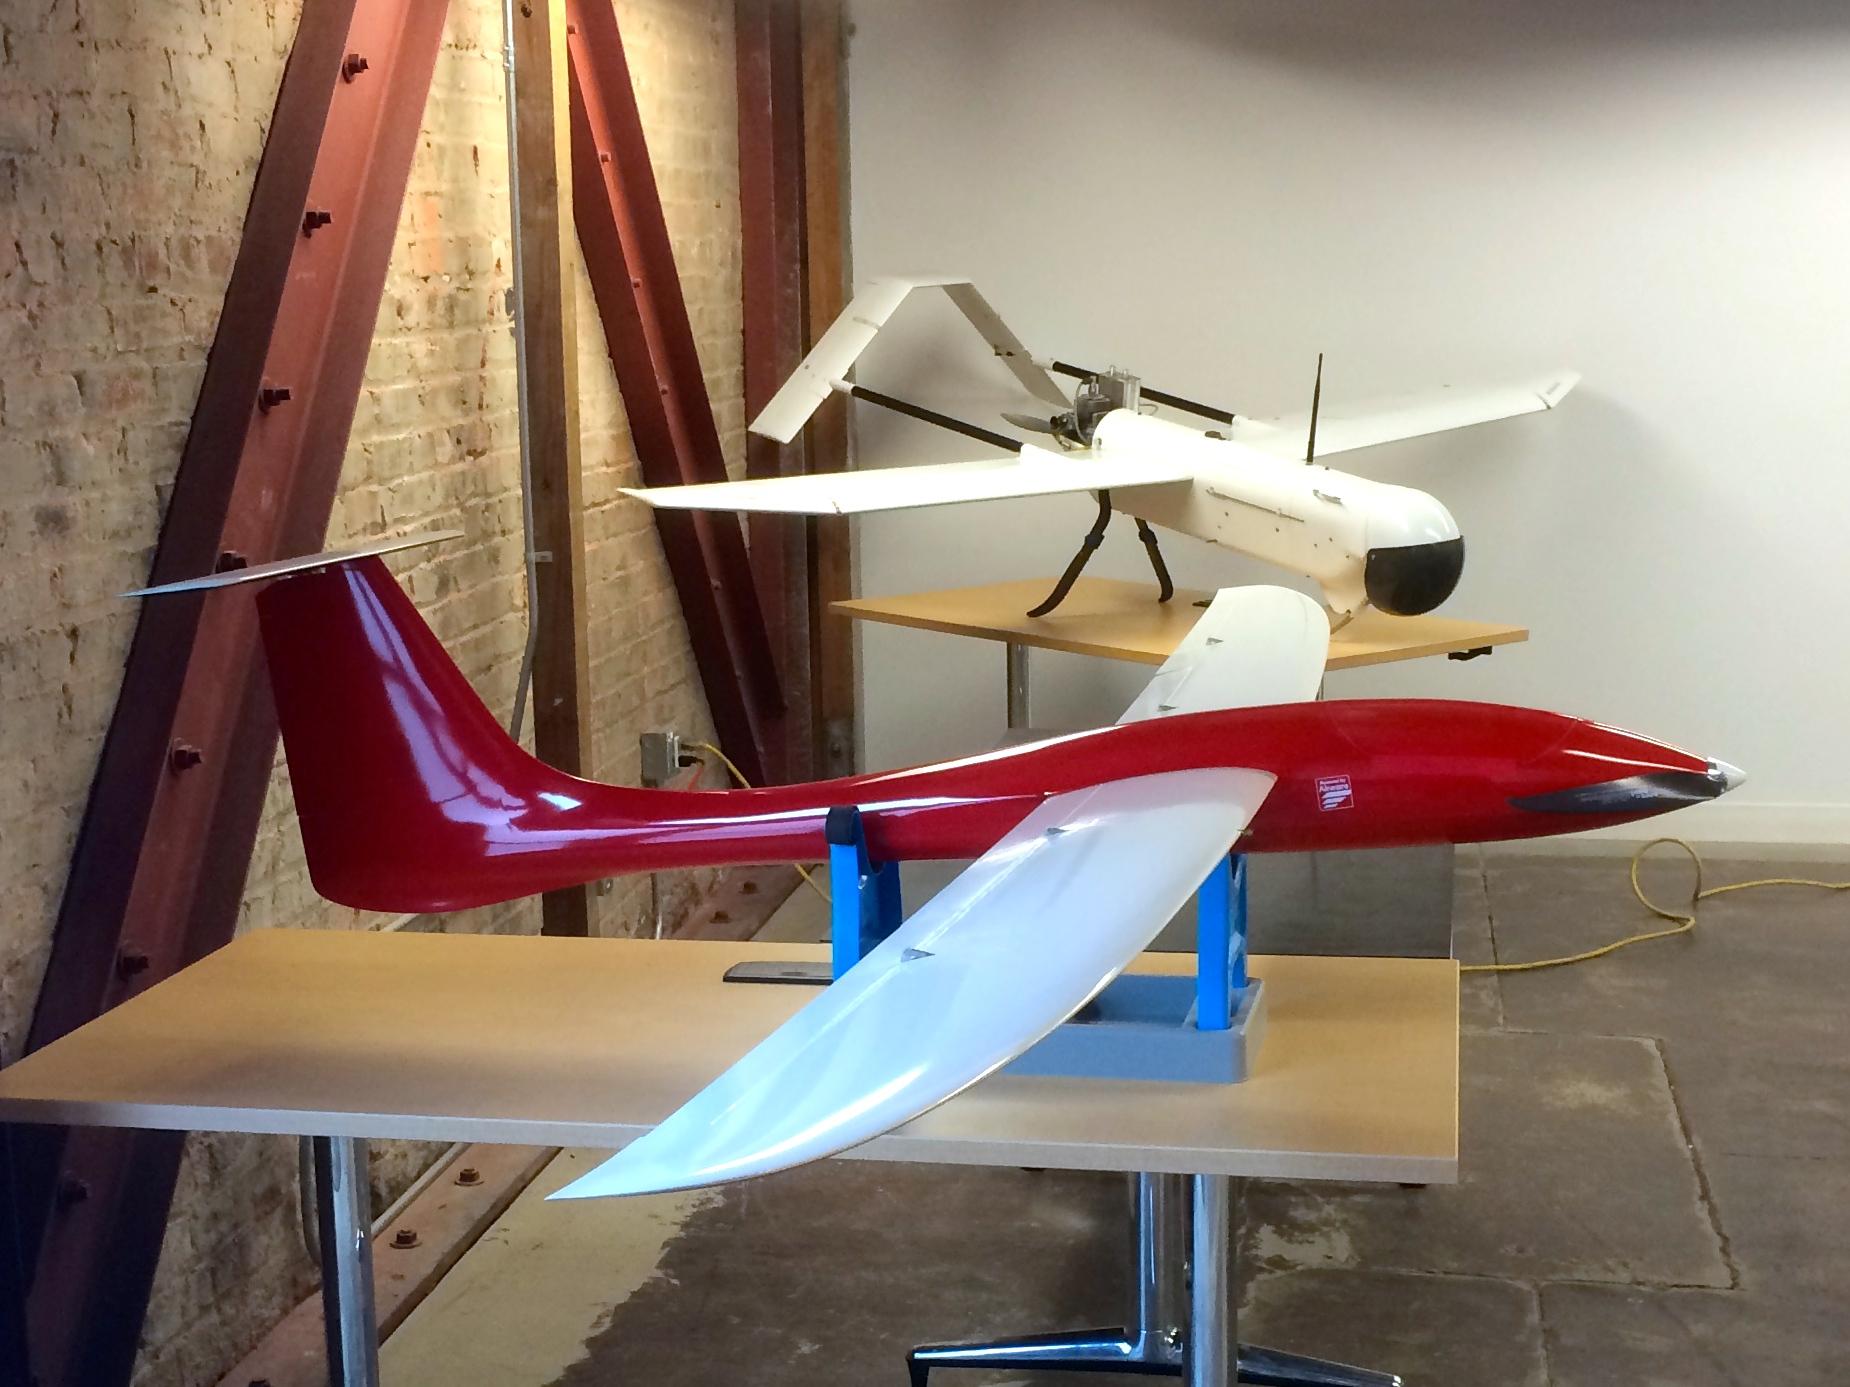 Airware drone